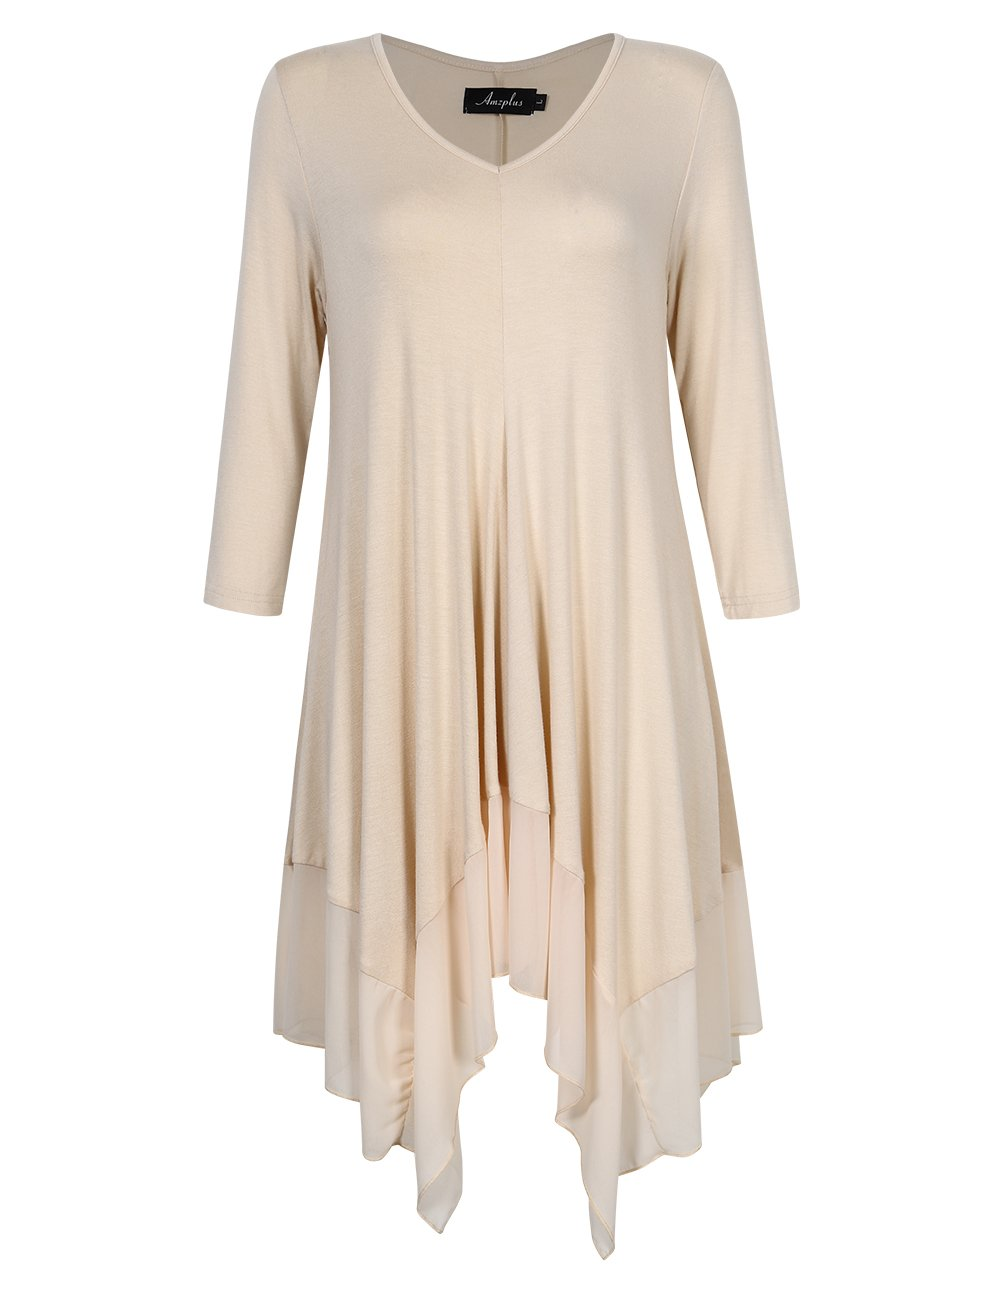 AMZ PLUS Womens Plus Size Irregular Hem Short Sleeve Loose Shirt Dress Top X2-Q3U1-P2F8